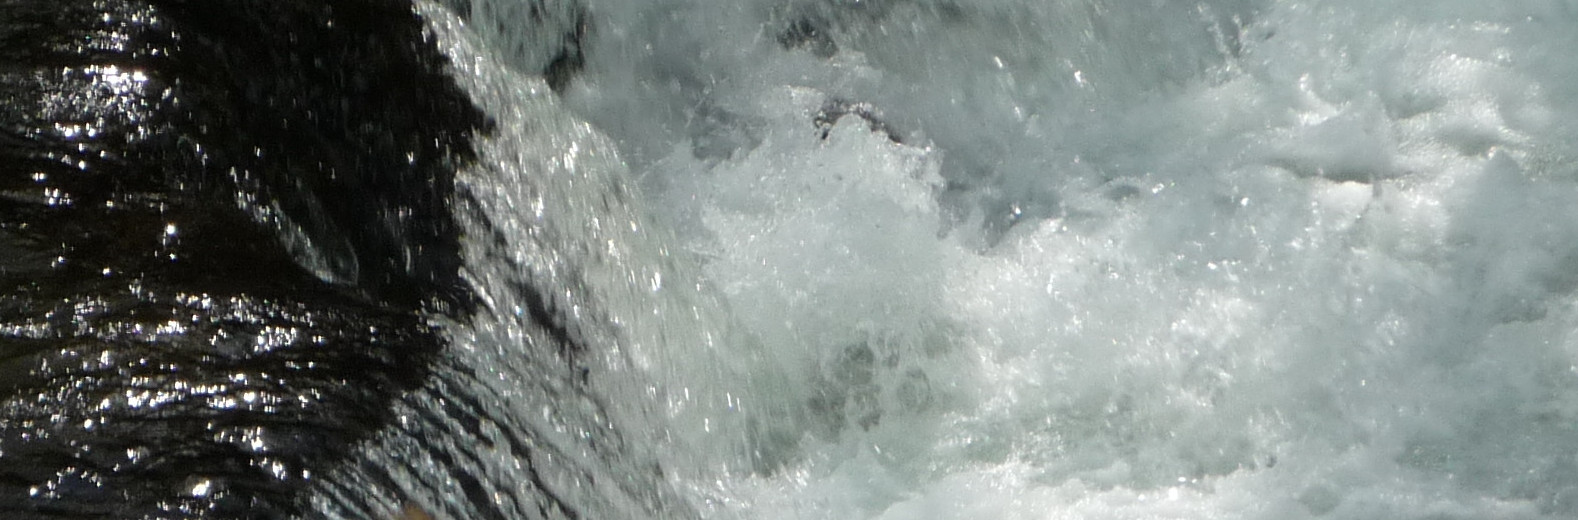 water strip